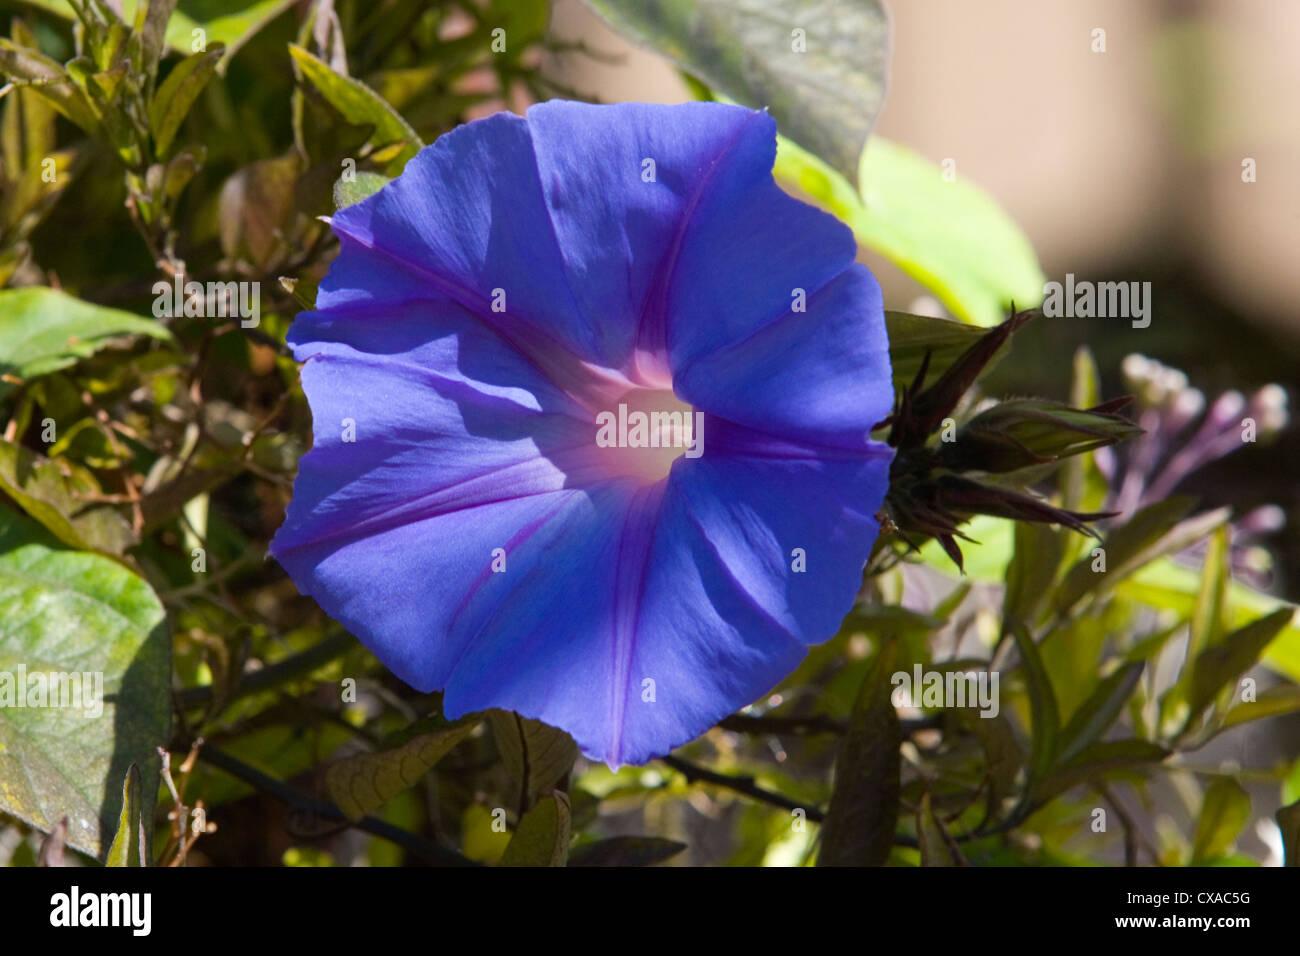 Morning Glory Flower - Stock Image